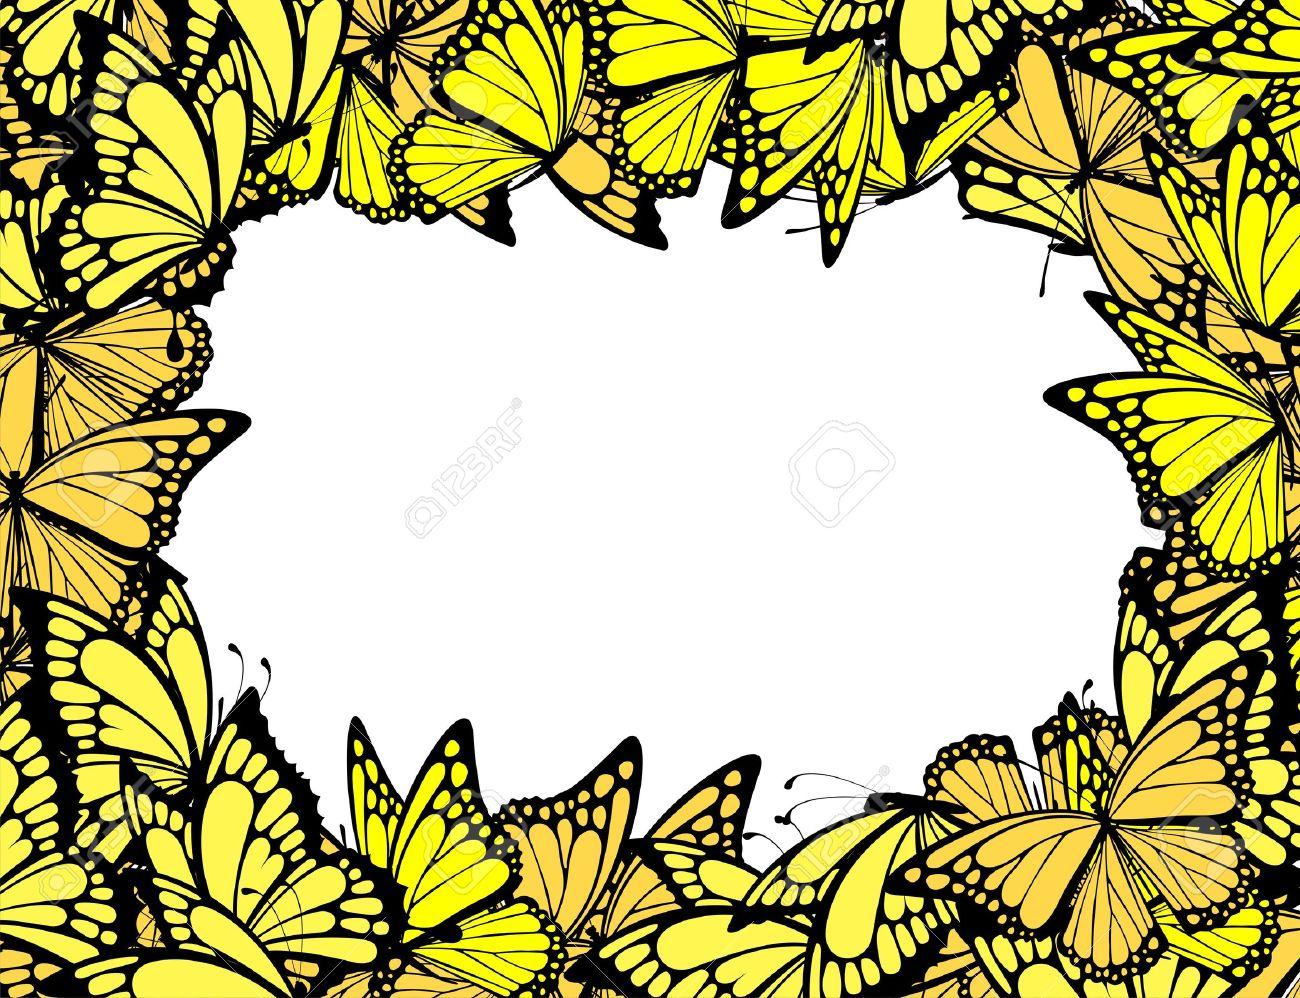 butterflies border individual objects in vector format royalty free rh 123rf com vector borders free vector border art